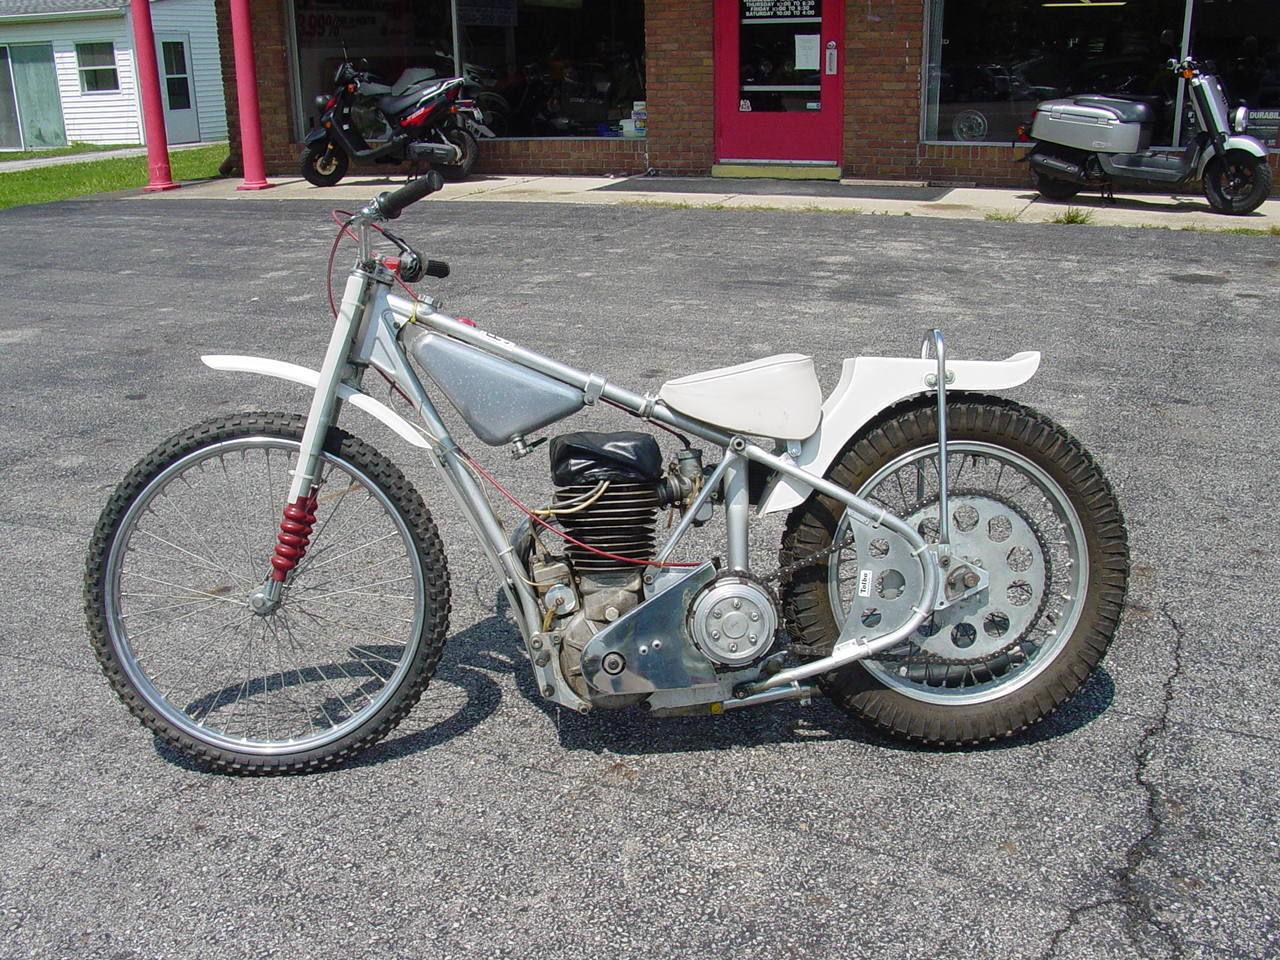 Motorbike also Original in addition Ok Supreme Jap Cc X further Dsc likewise Img Copy. on jap engine for sale